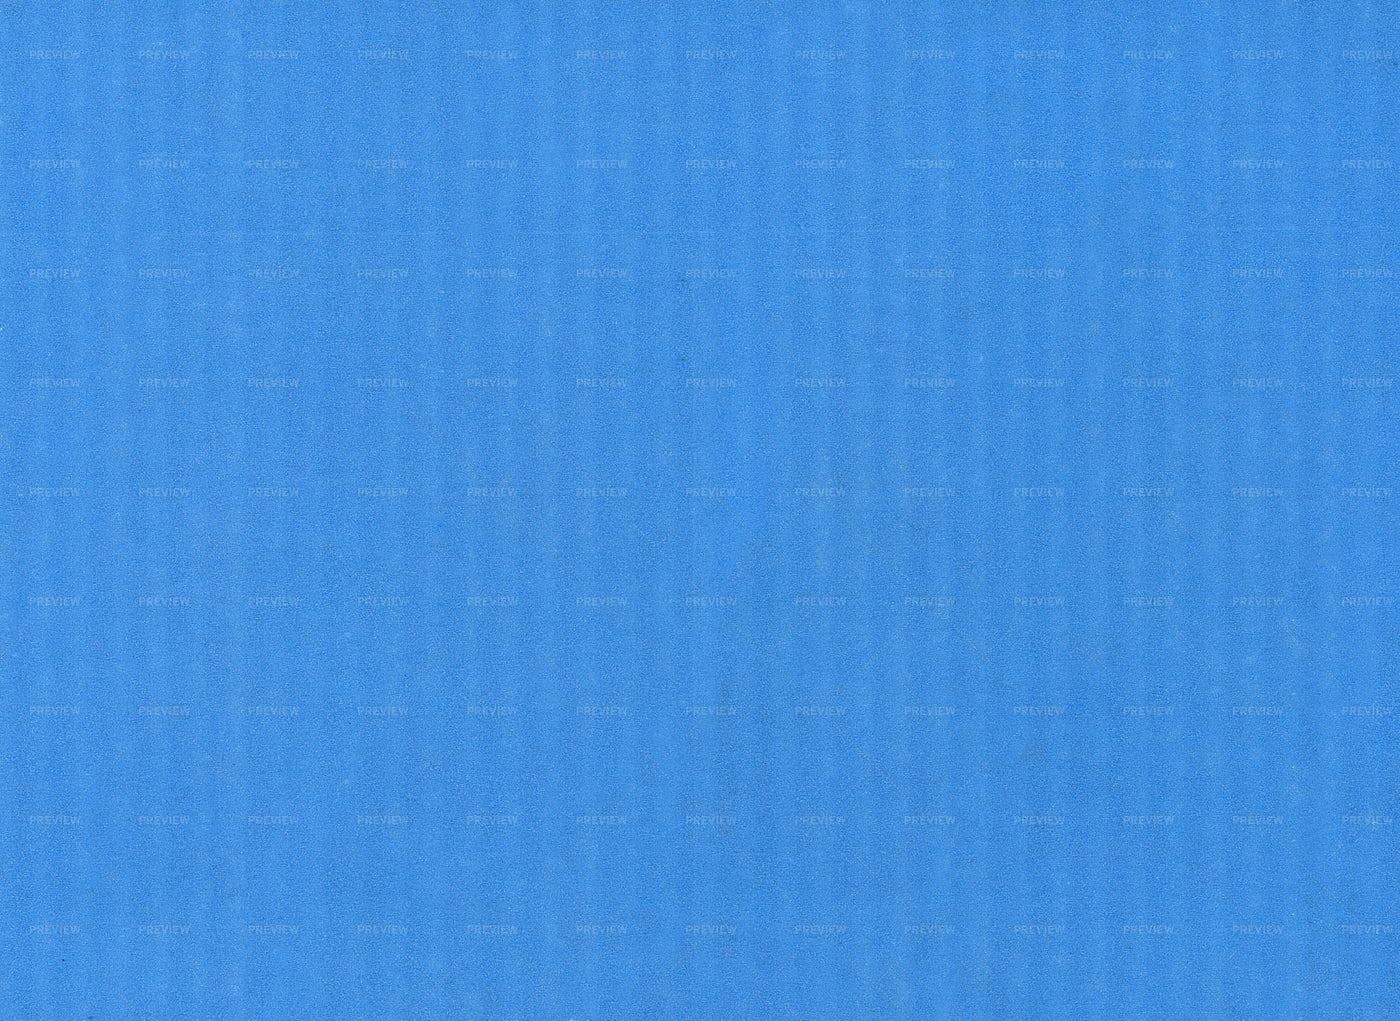 Light Blue Cardboard: Stock Photos